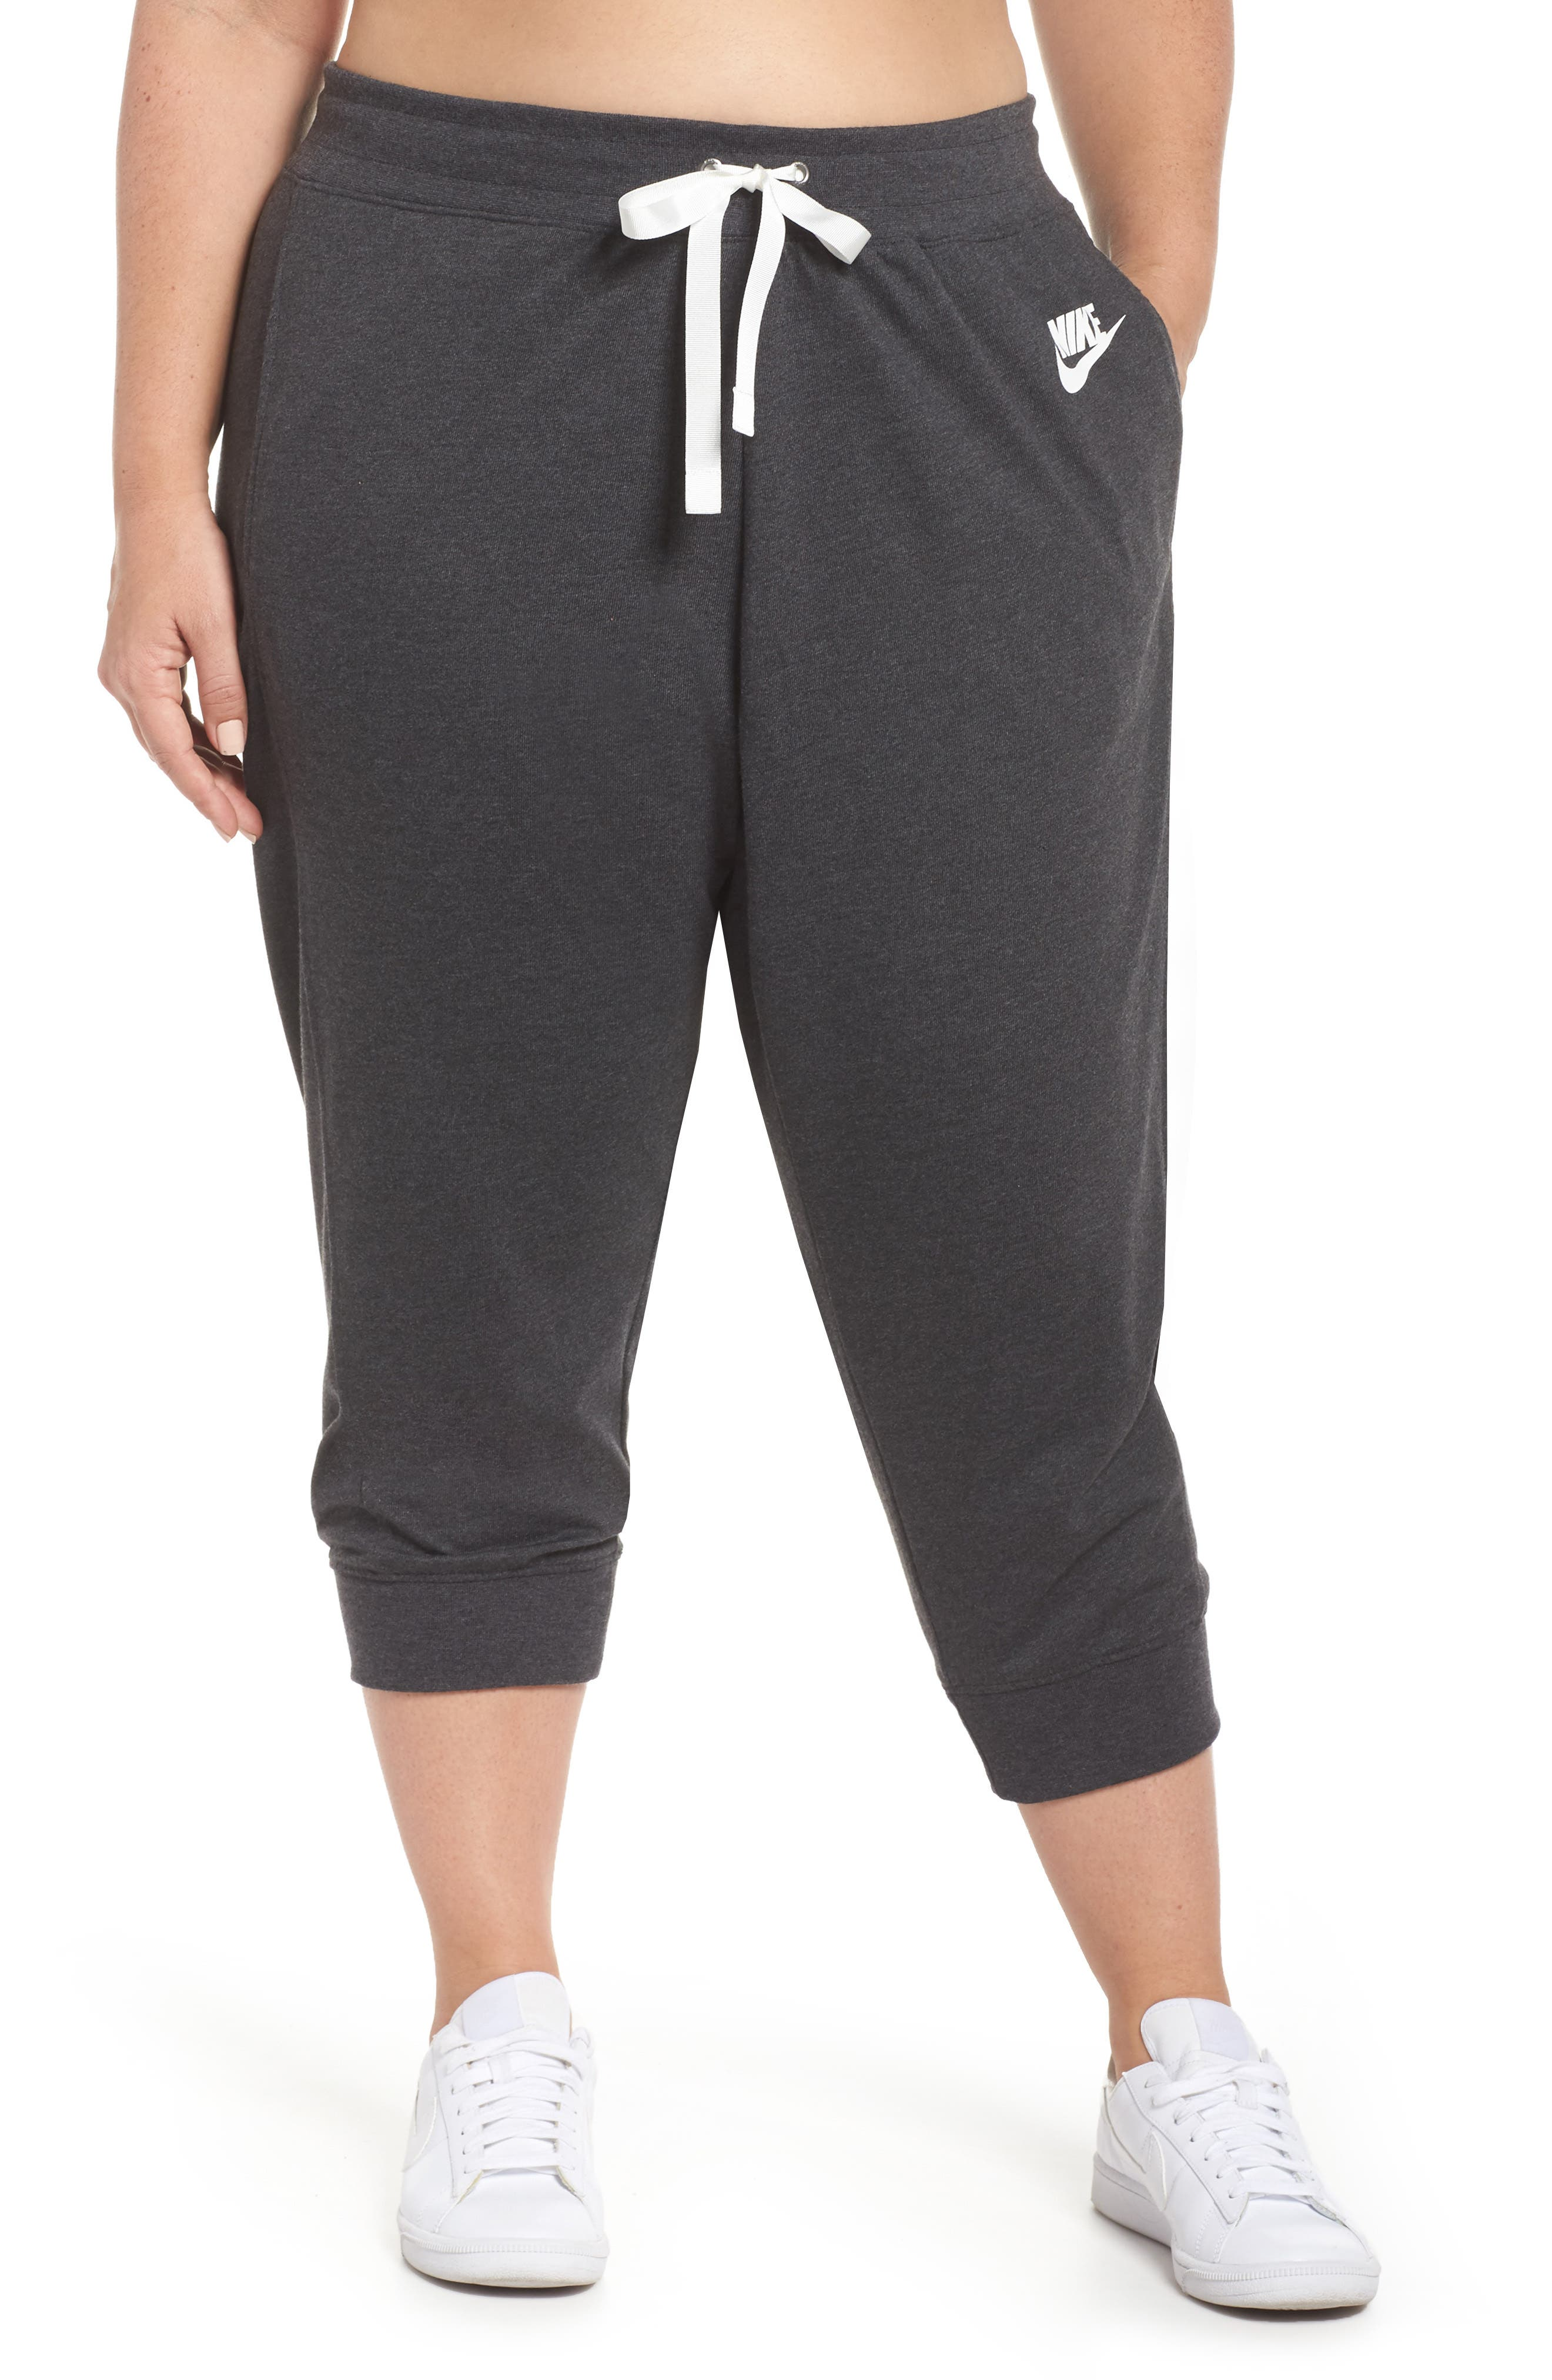 Sportswear Gym Capris,                         Main,                         color, Black Heather/ Sail